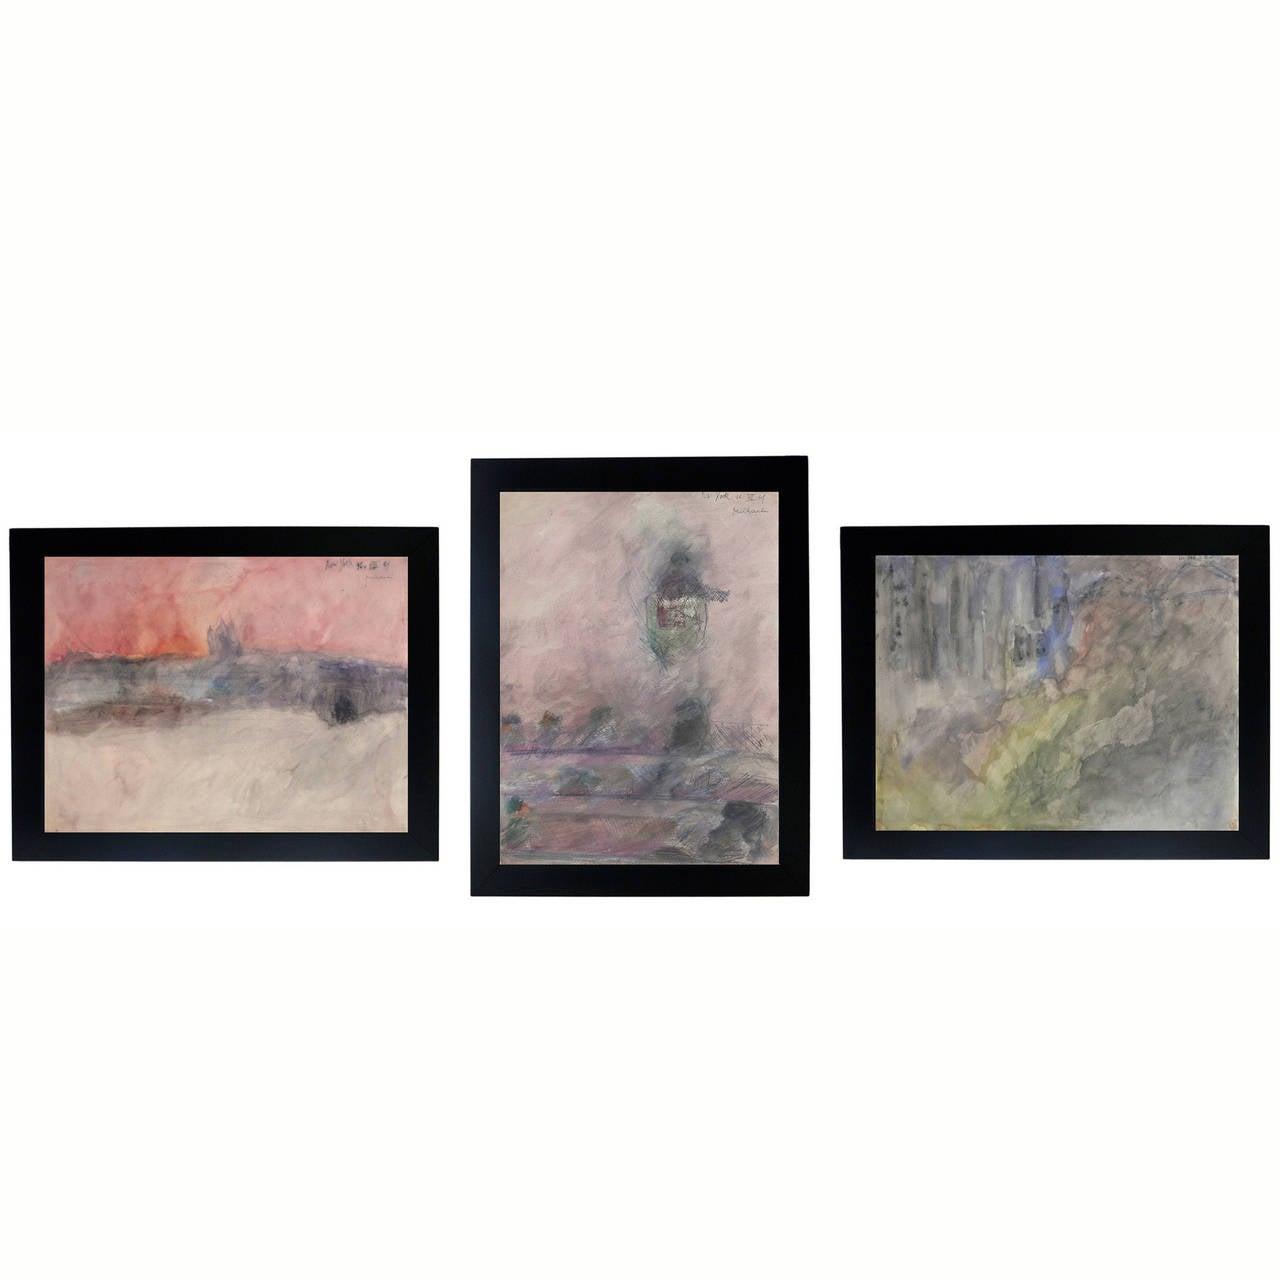 Selection of New York Landscape Watercolors by Jochen Michaelis